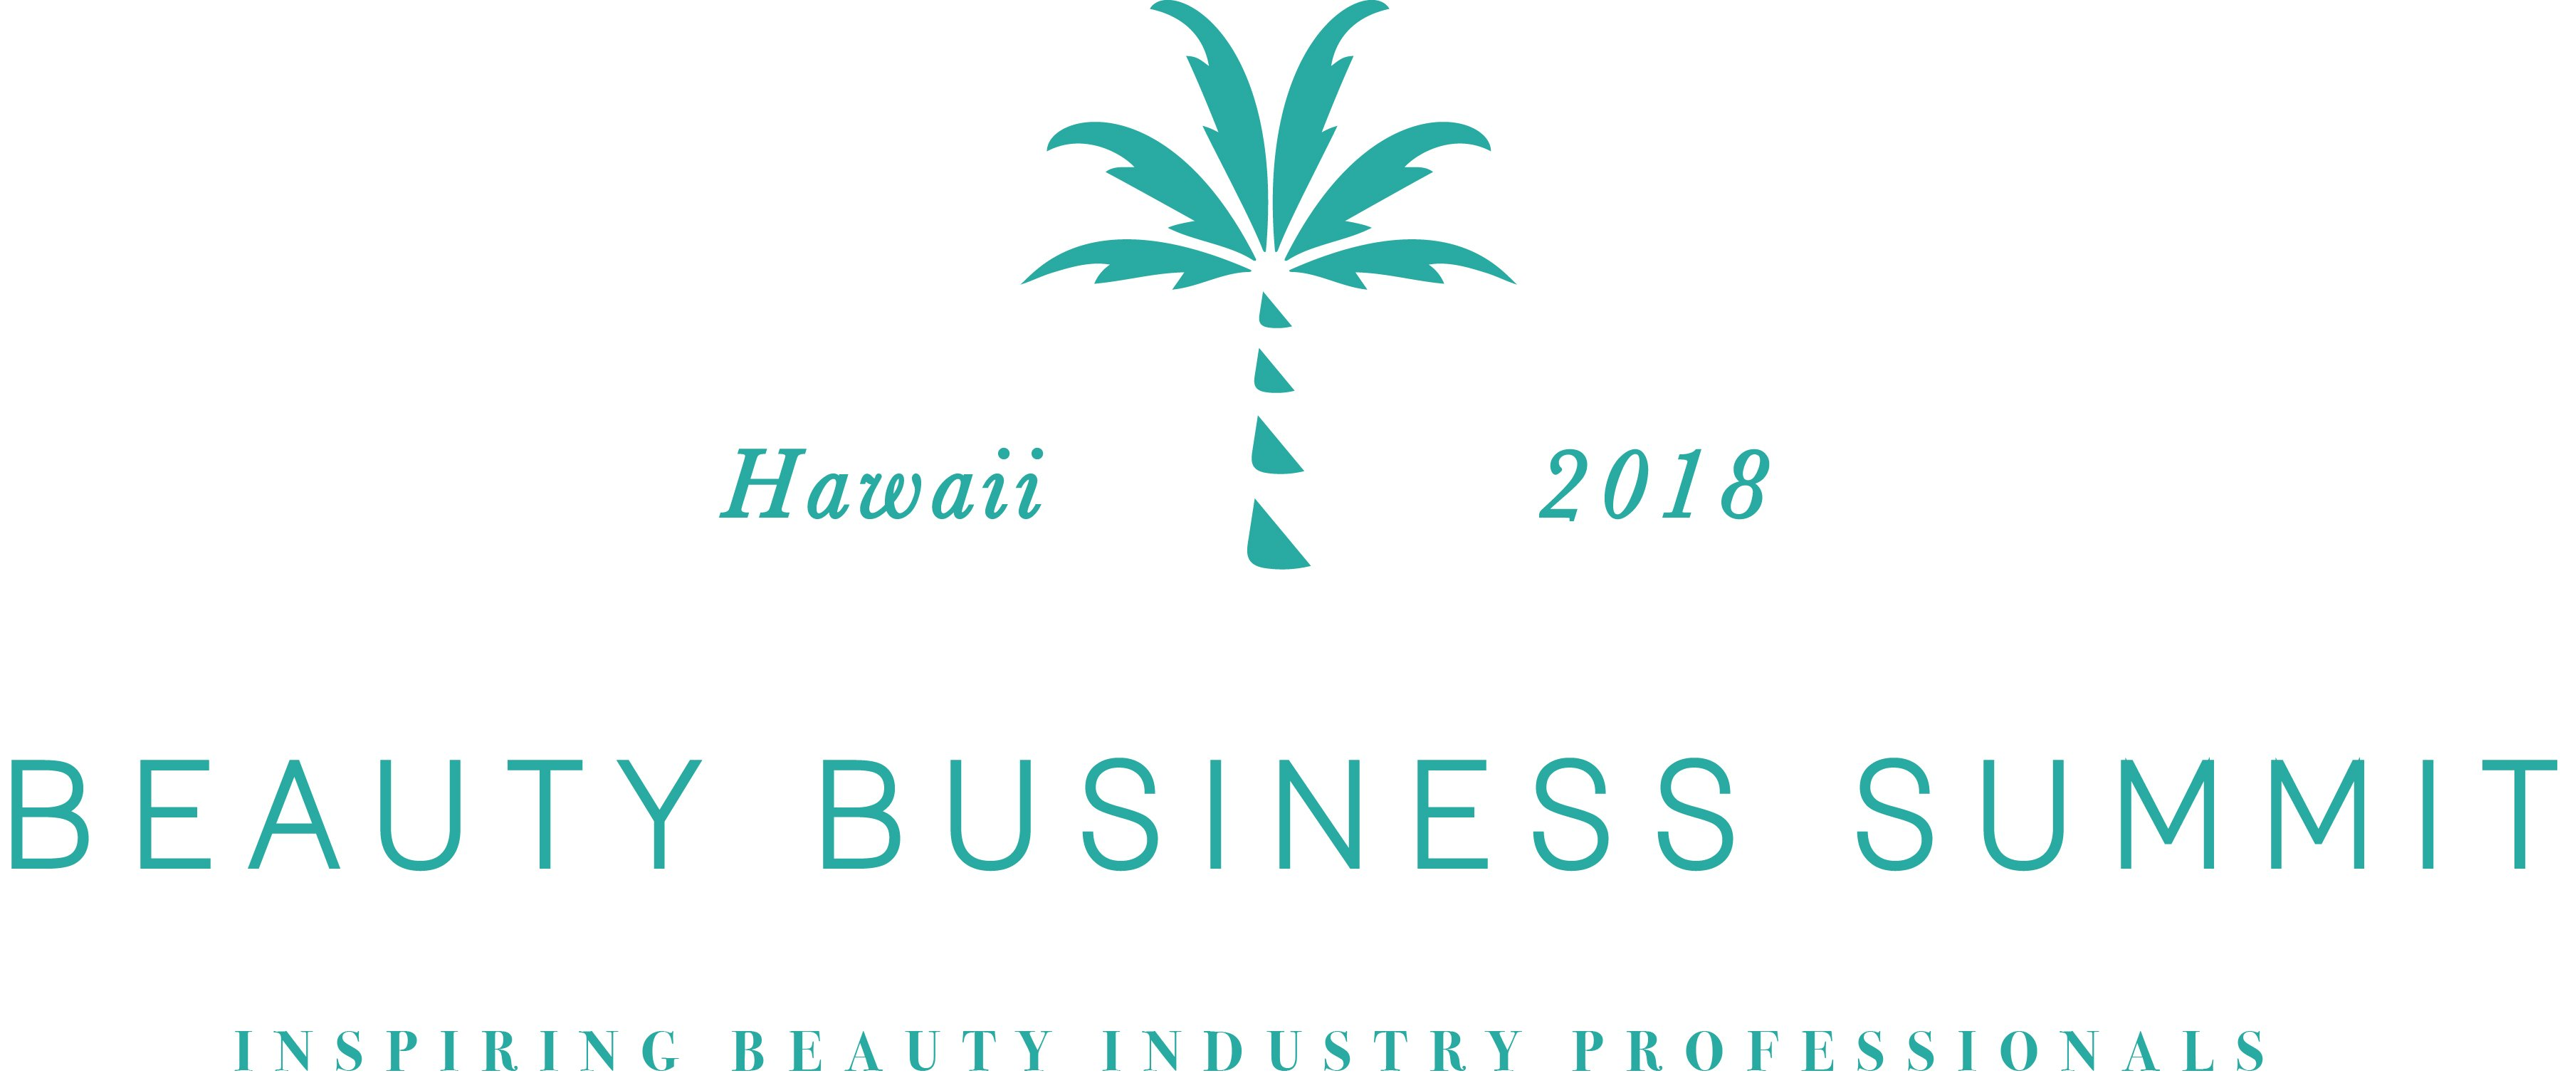 Beauty Business Summit